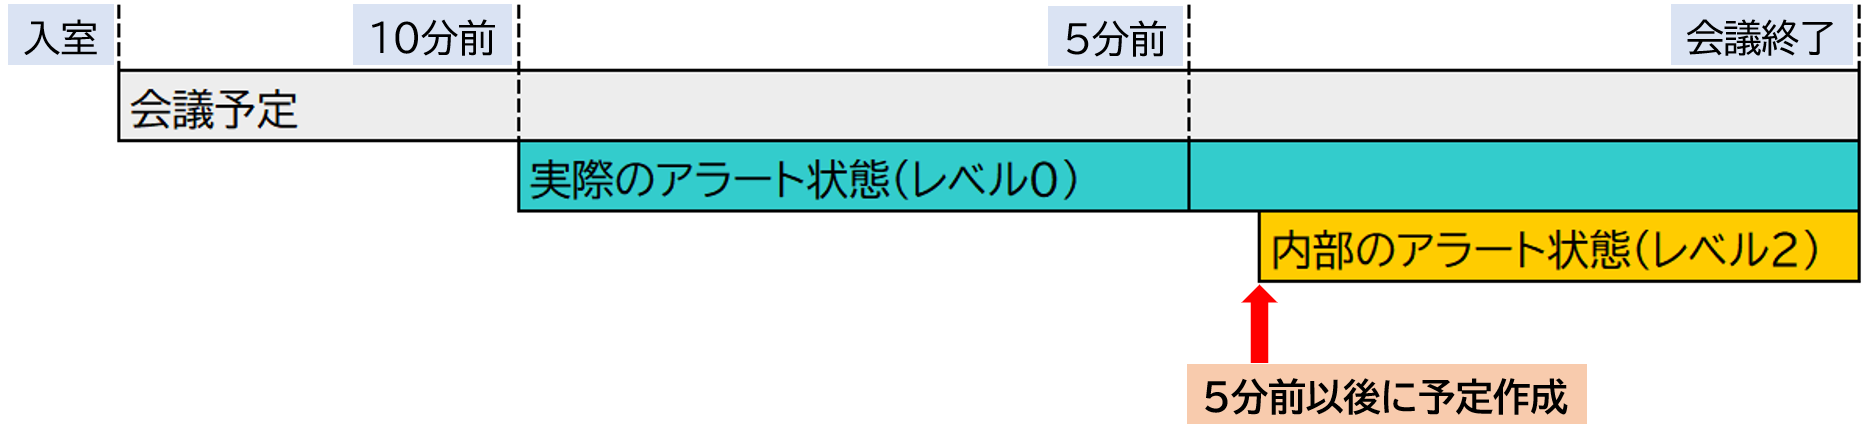 web-08